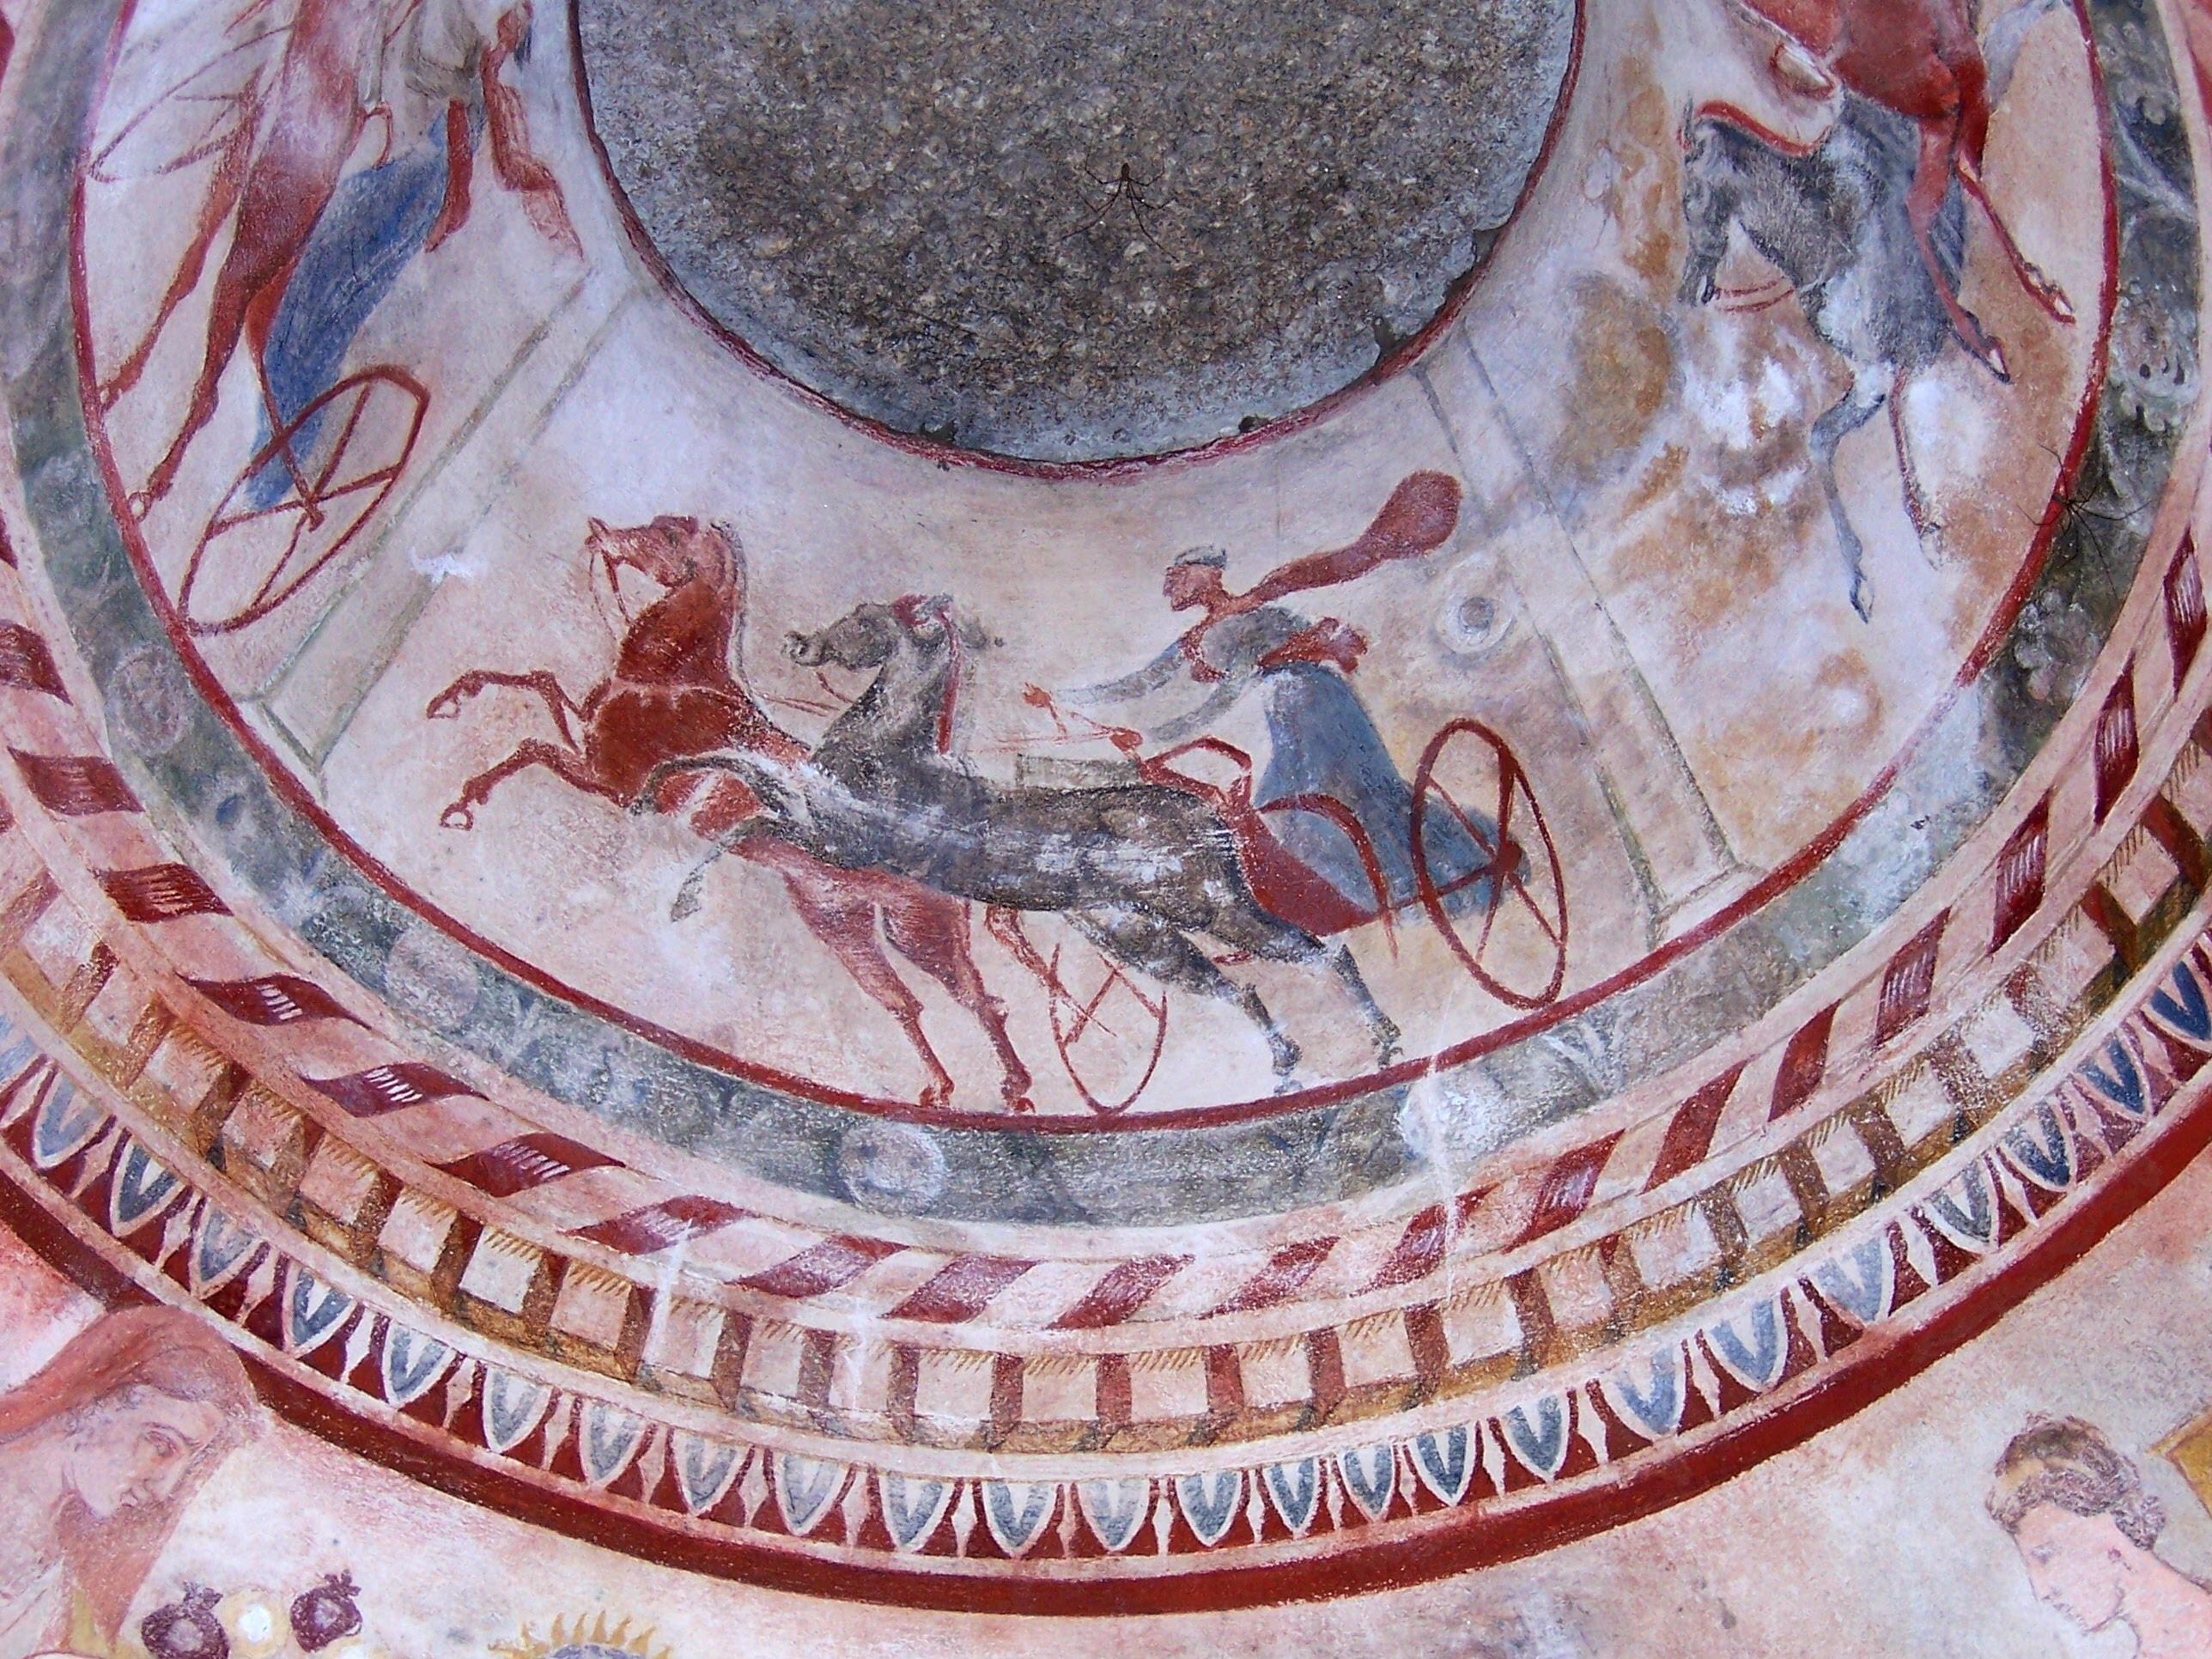 4.3.3.10. The Thracian Tomb of Kazanlak